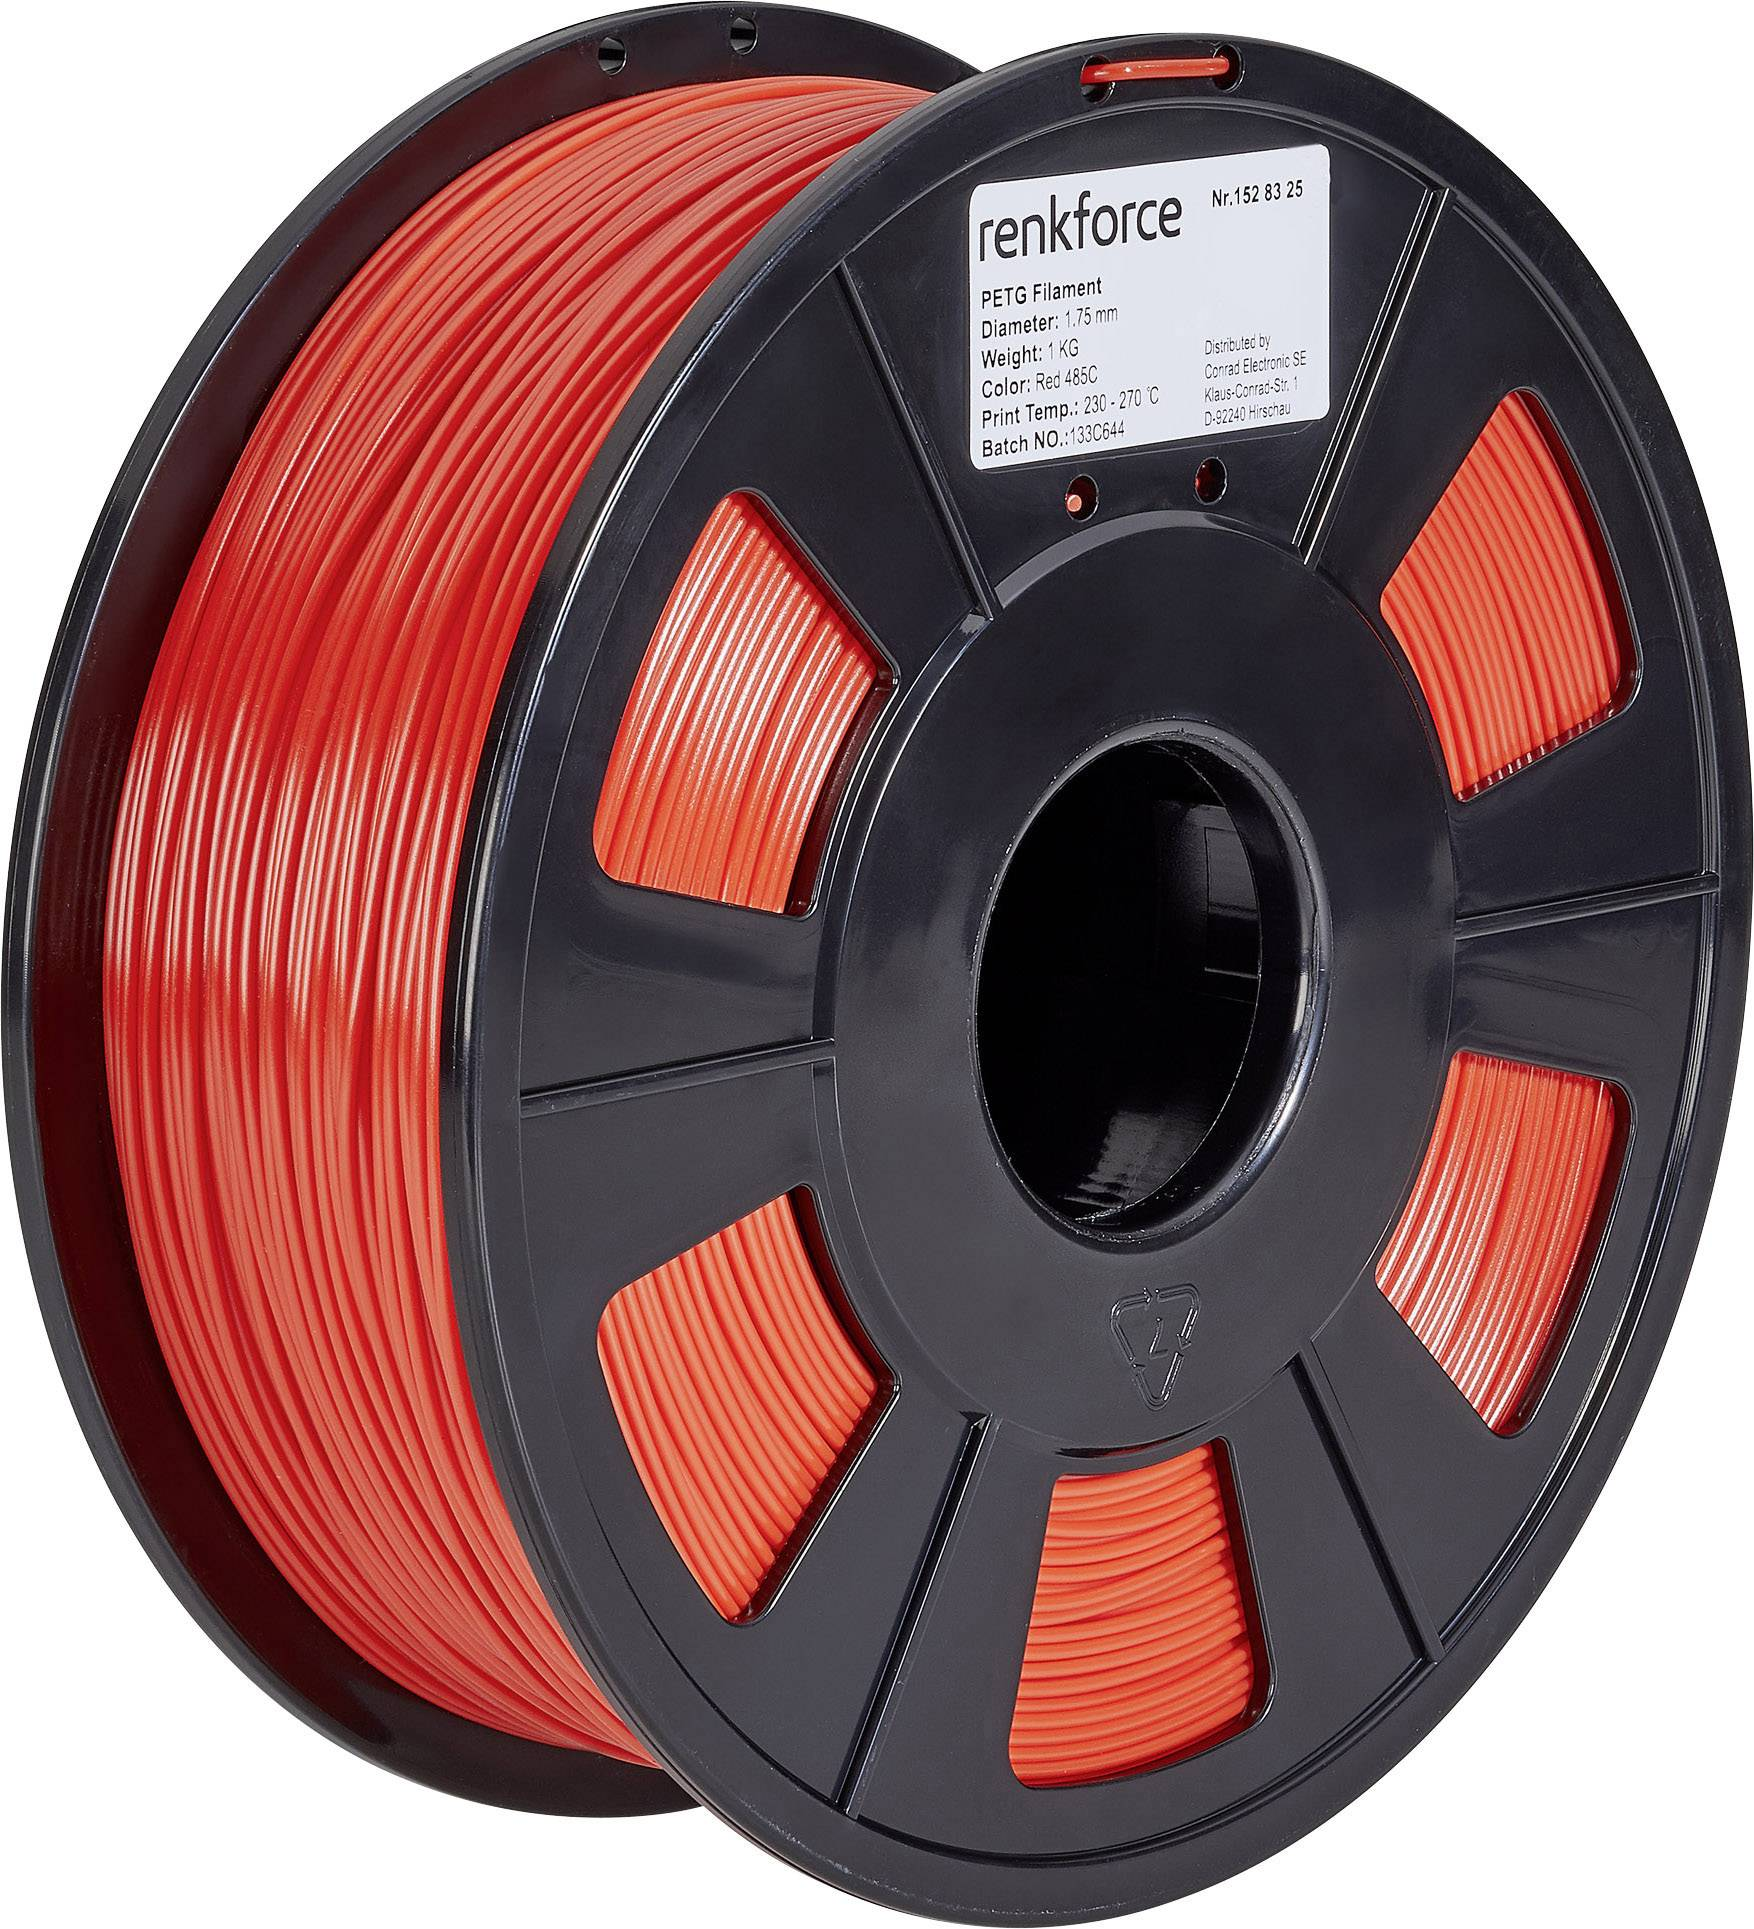 Vlákno pre 3Dtlačiarne, Renkforce 01.04.18.1104, PETG plast, 1.75 mm, 1 kg, červená